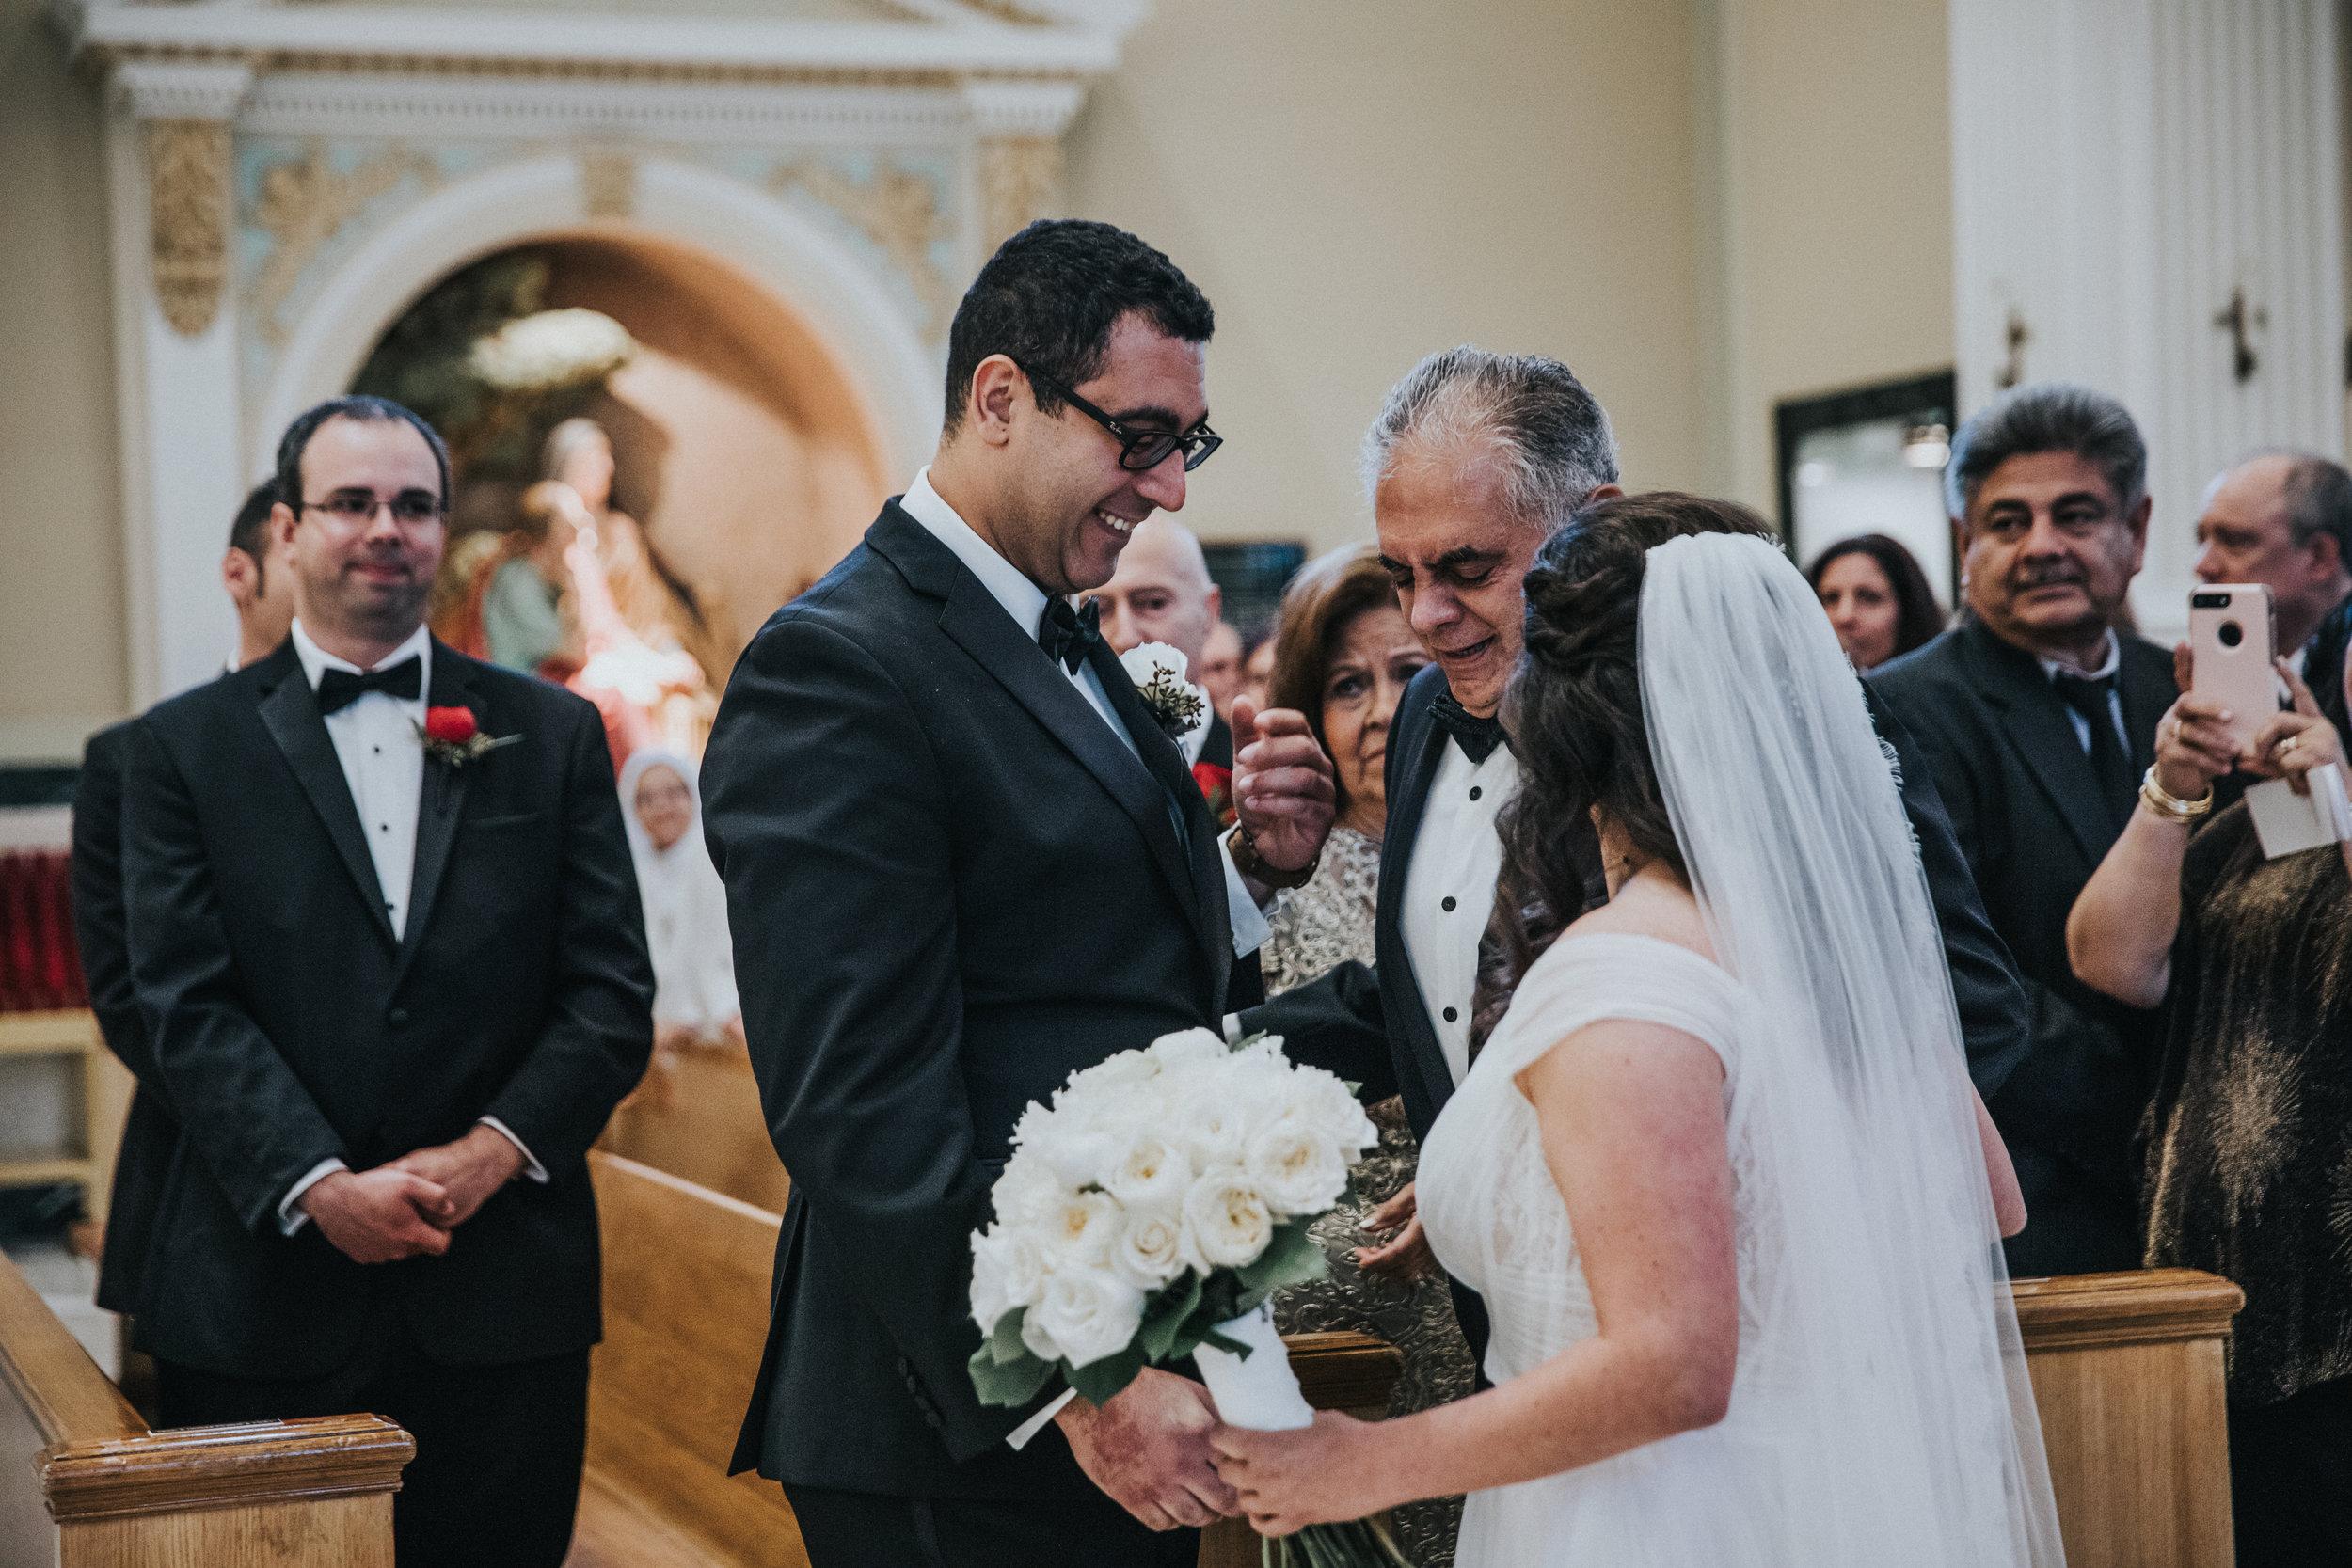 JennaLynnPhotography-NJWeddingPhotographer-Philadelphia-Wedding-ArtsBallroom-Ceremony-29.jpg